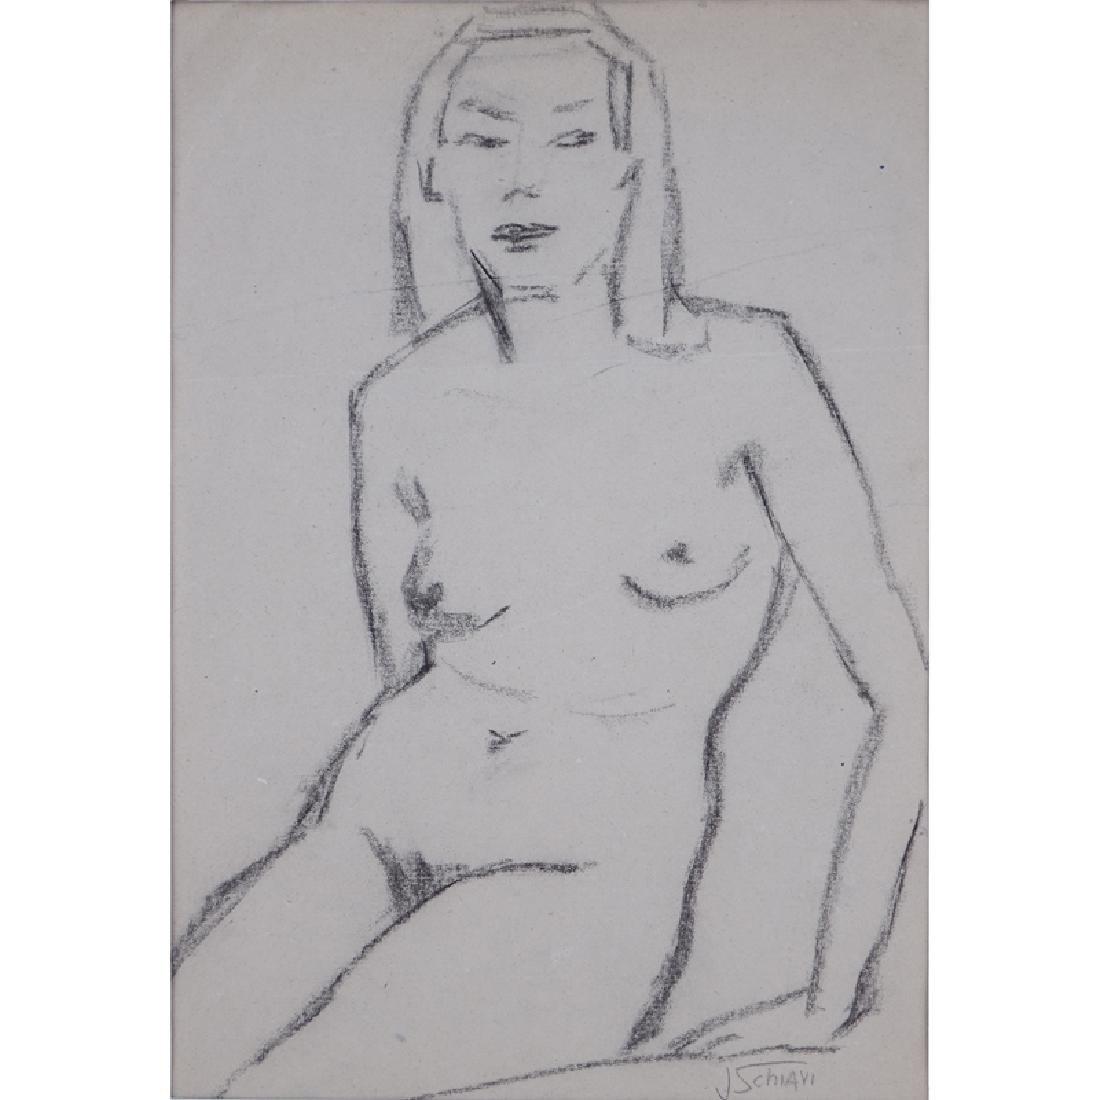 Jolanda Schiavi, Italian (1906-1976) Charcoal on paper